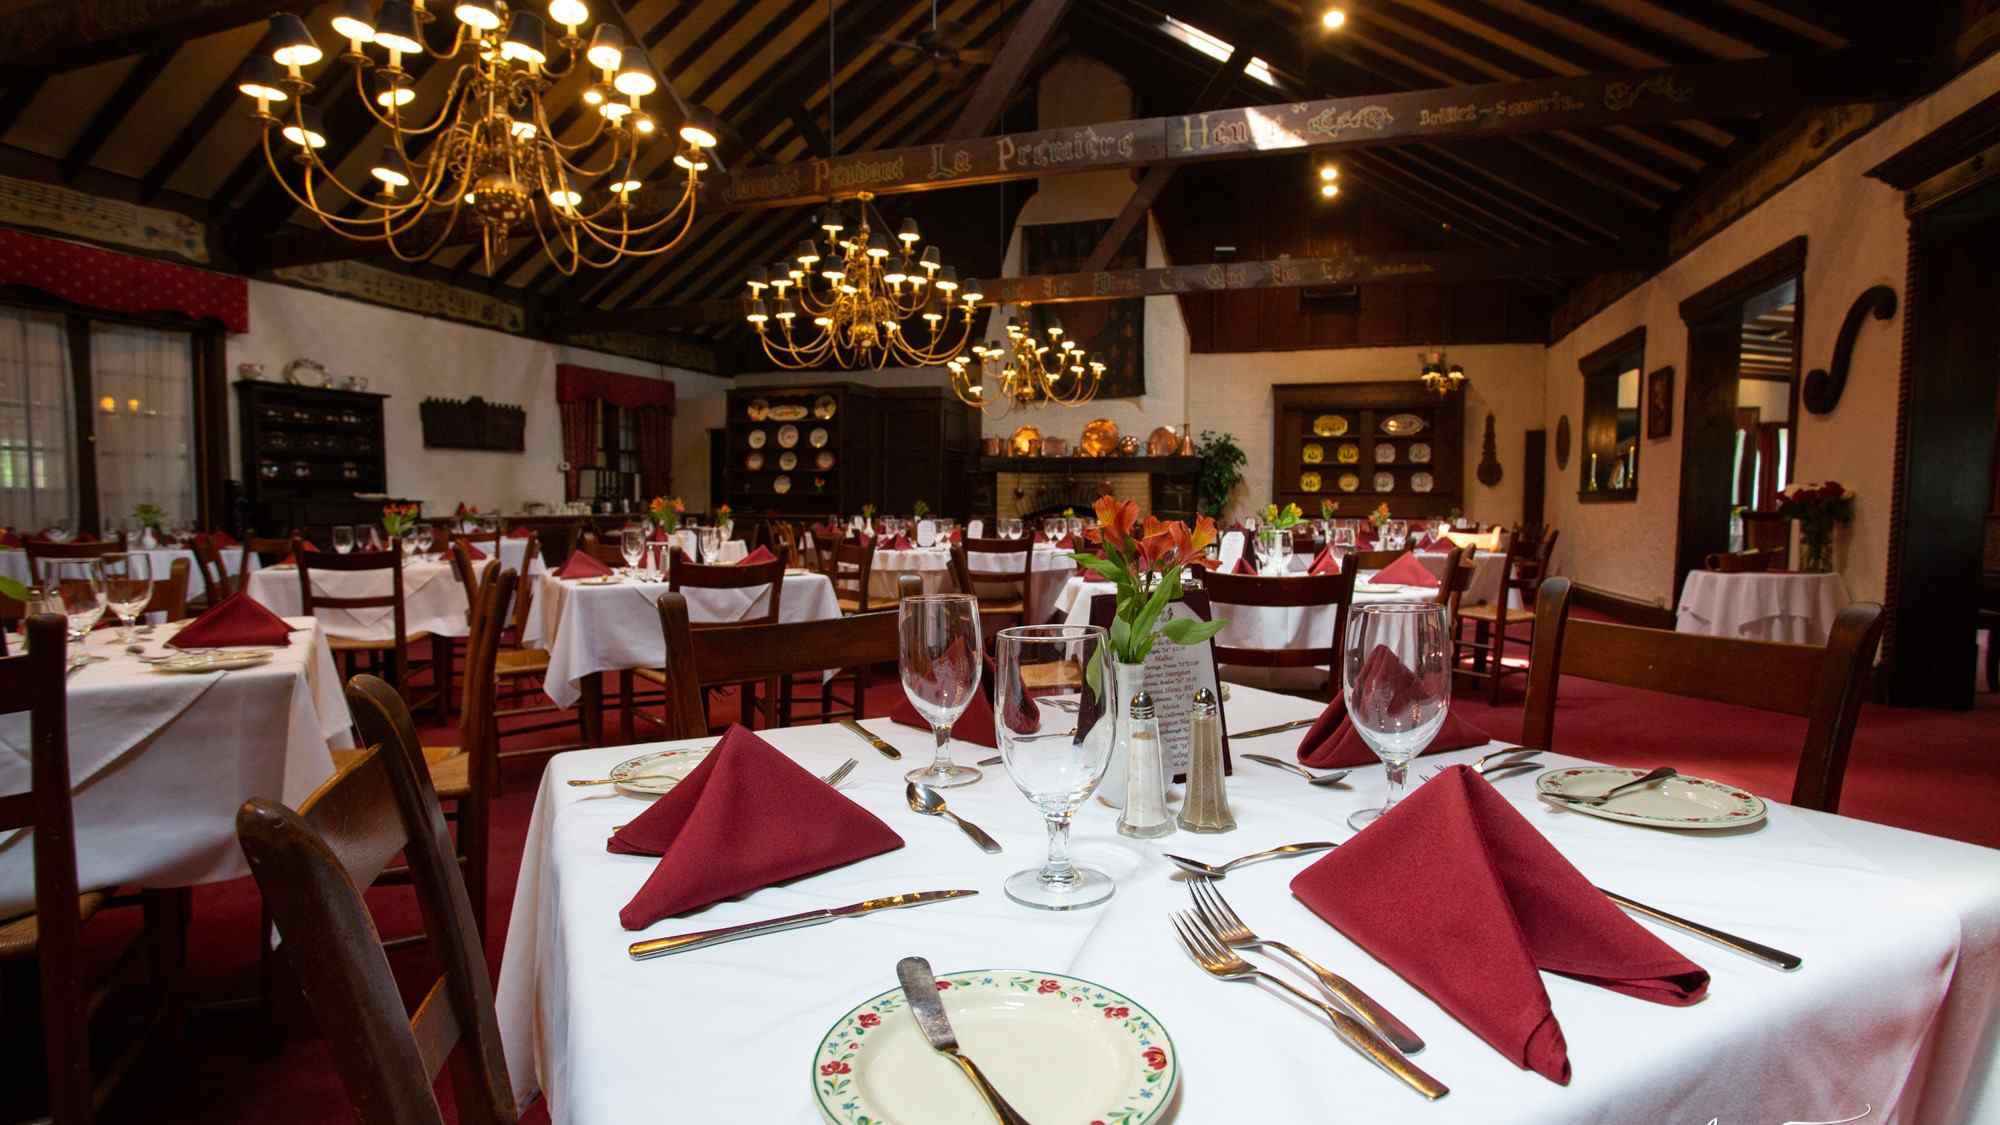 Normandie Farm Restaurant